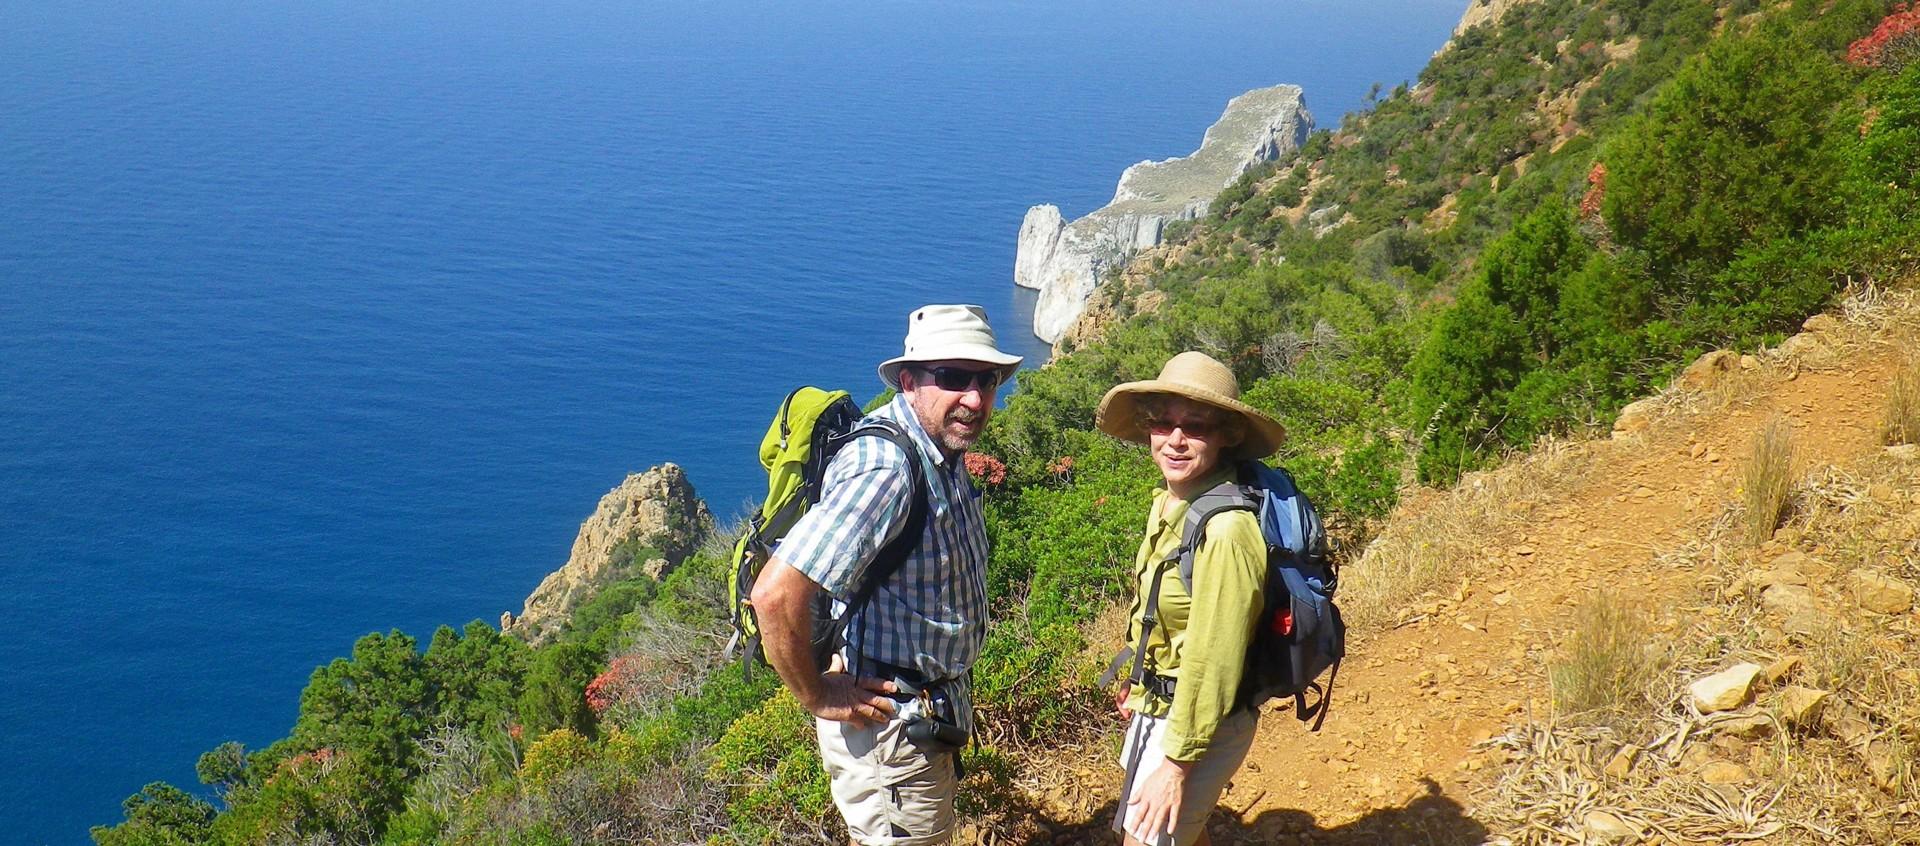 Pan di Zucchero 2 HP.jpg - Sardinia - South West Coast and Mountains Walk - Guided Holiday - Walking